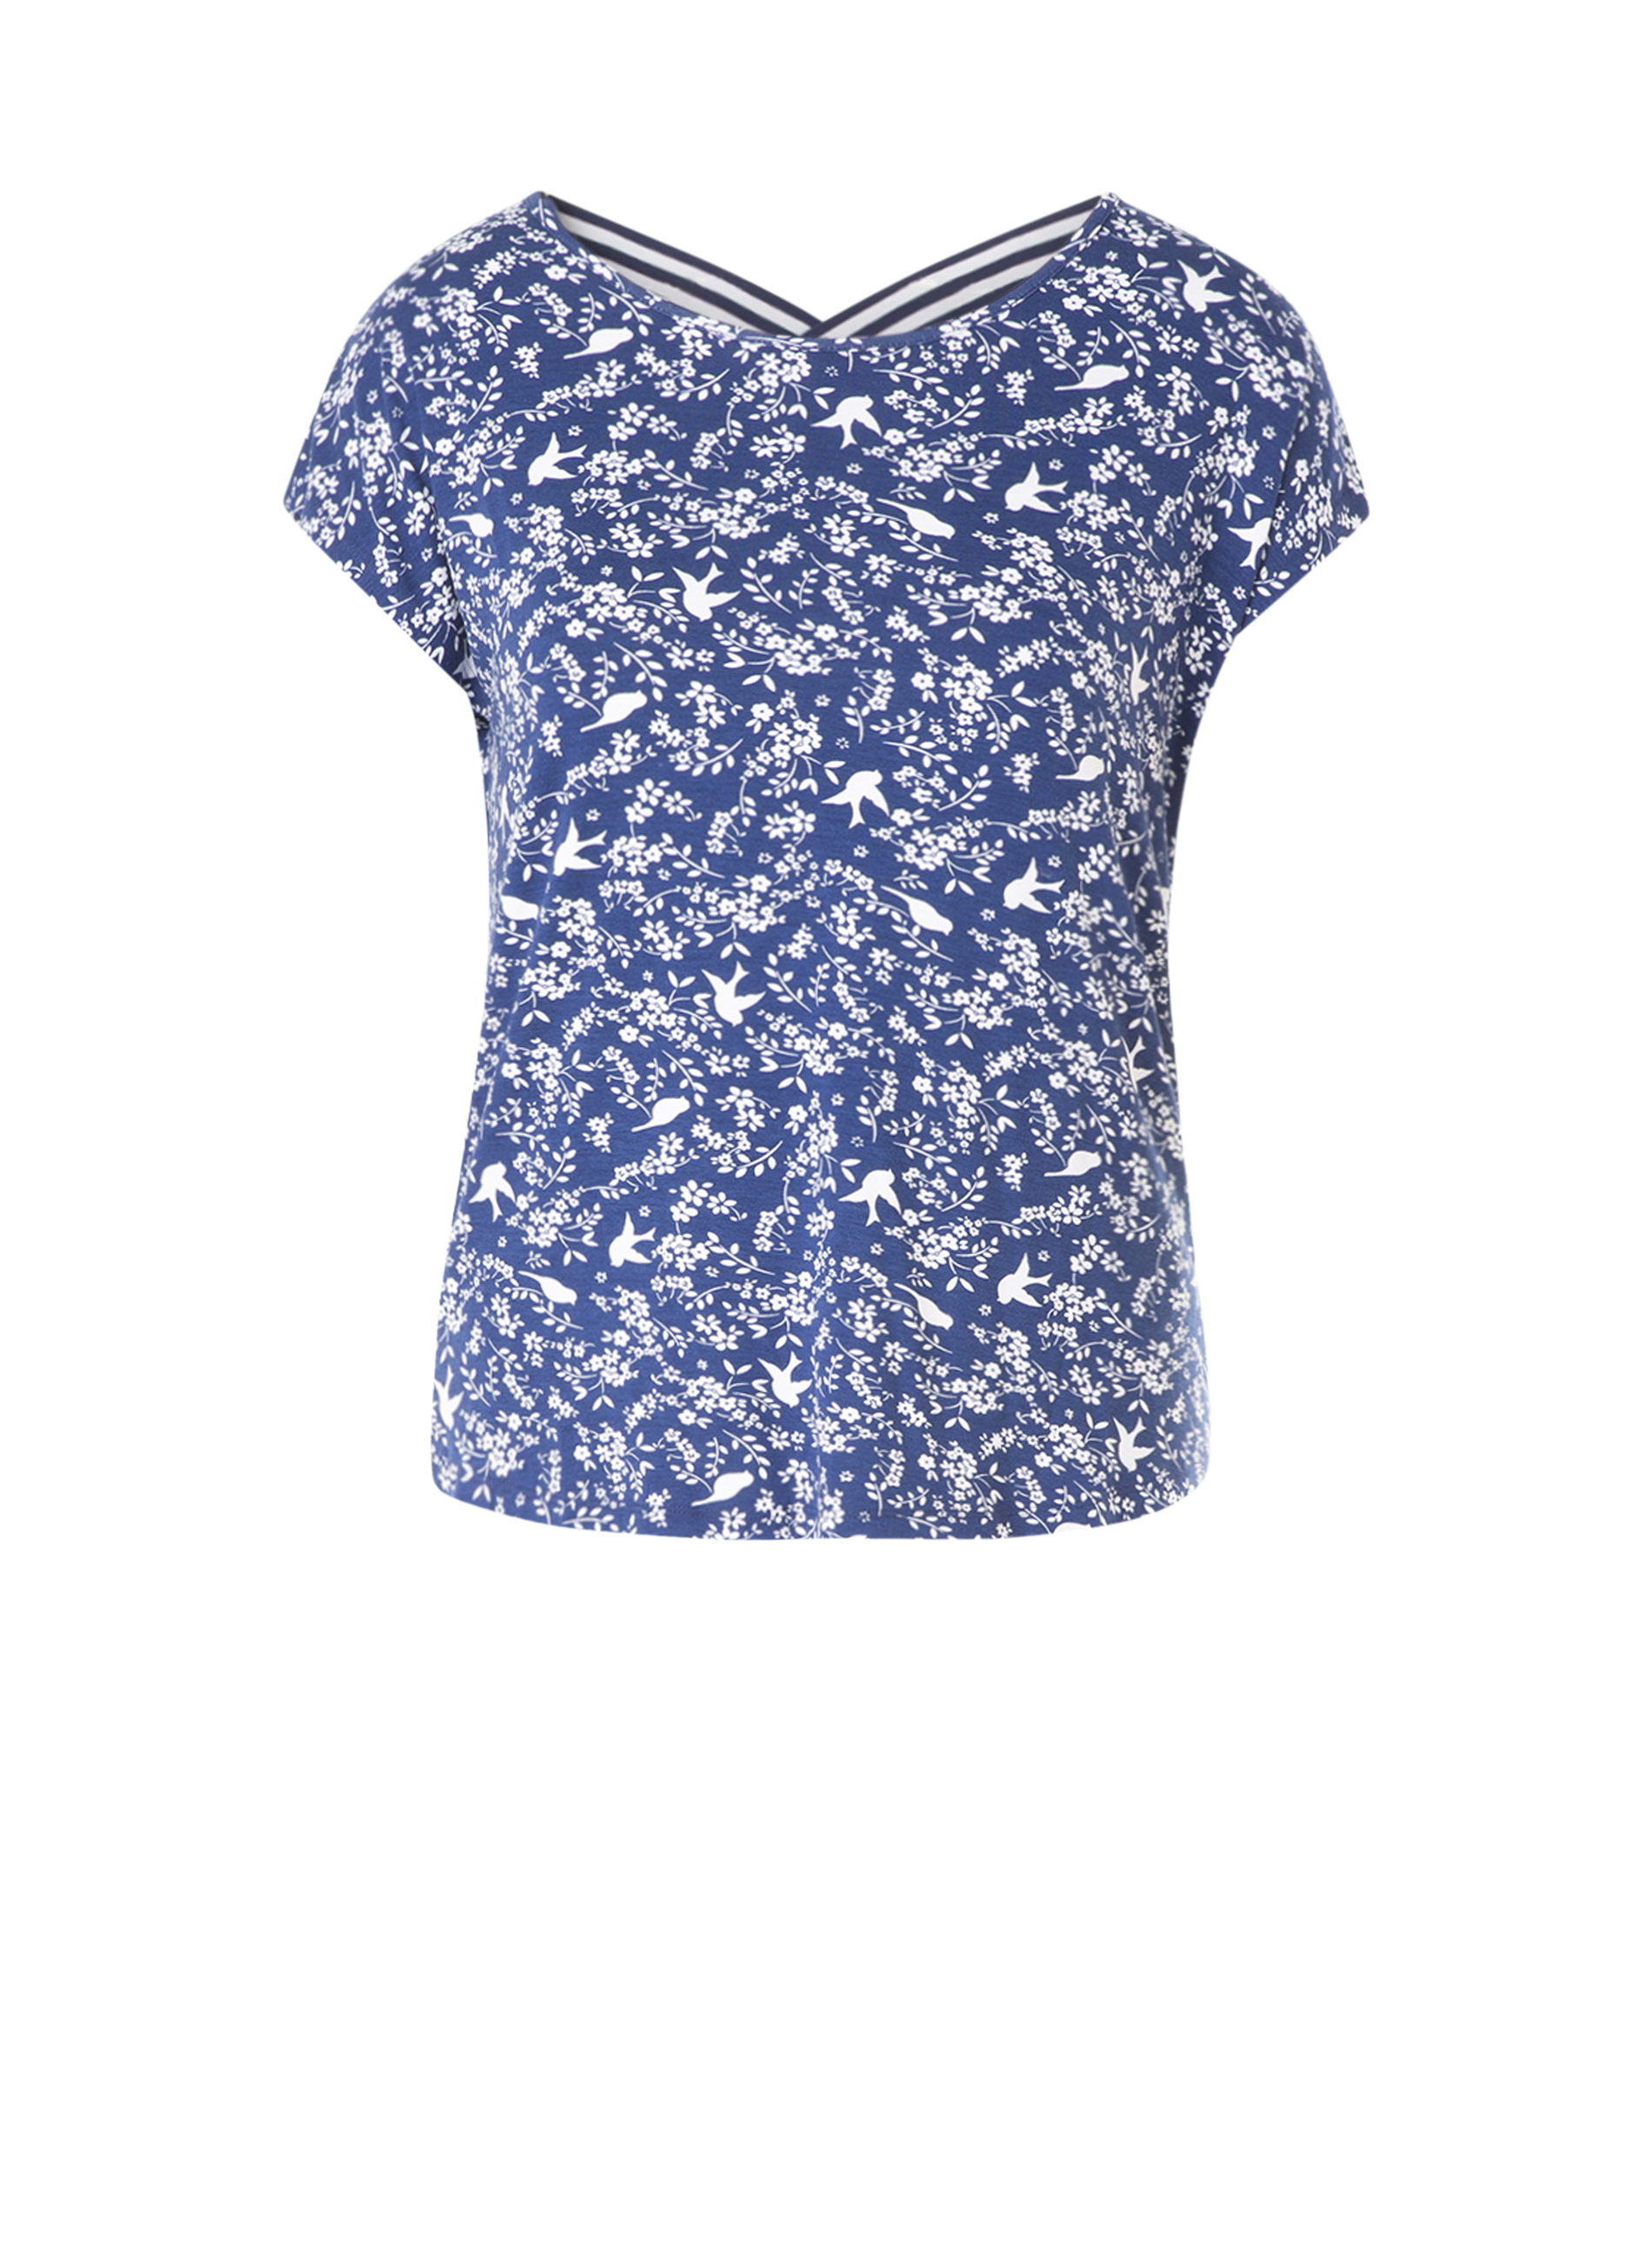 Shirt Louise 78 cm Yesta